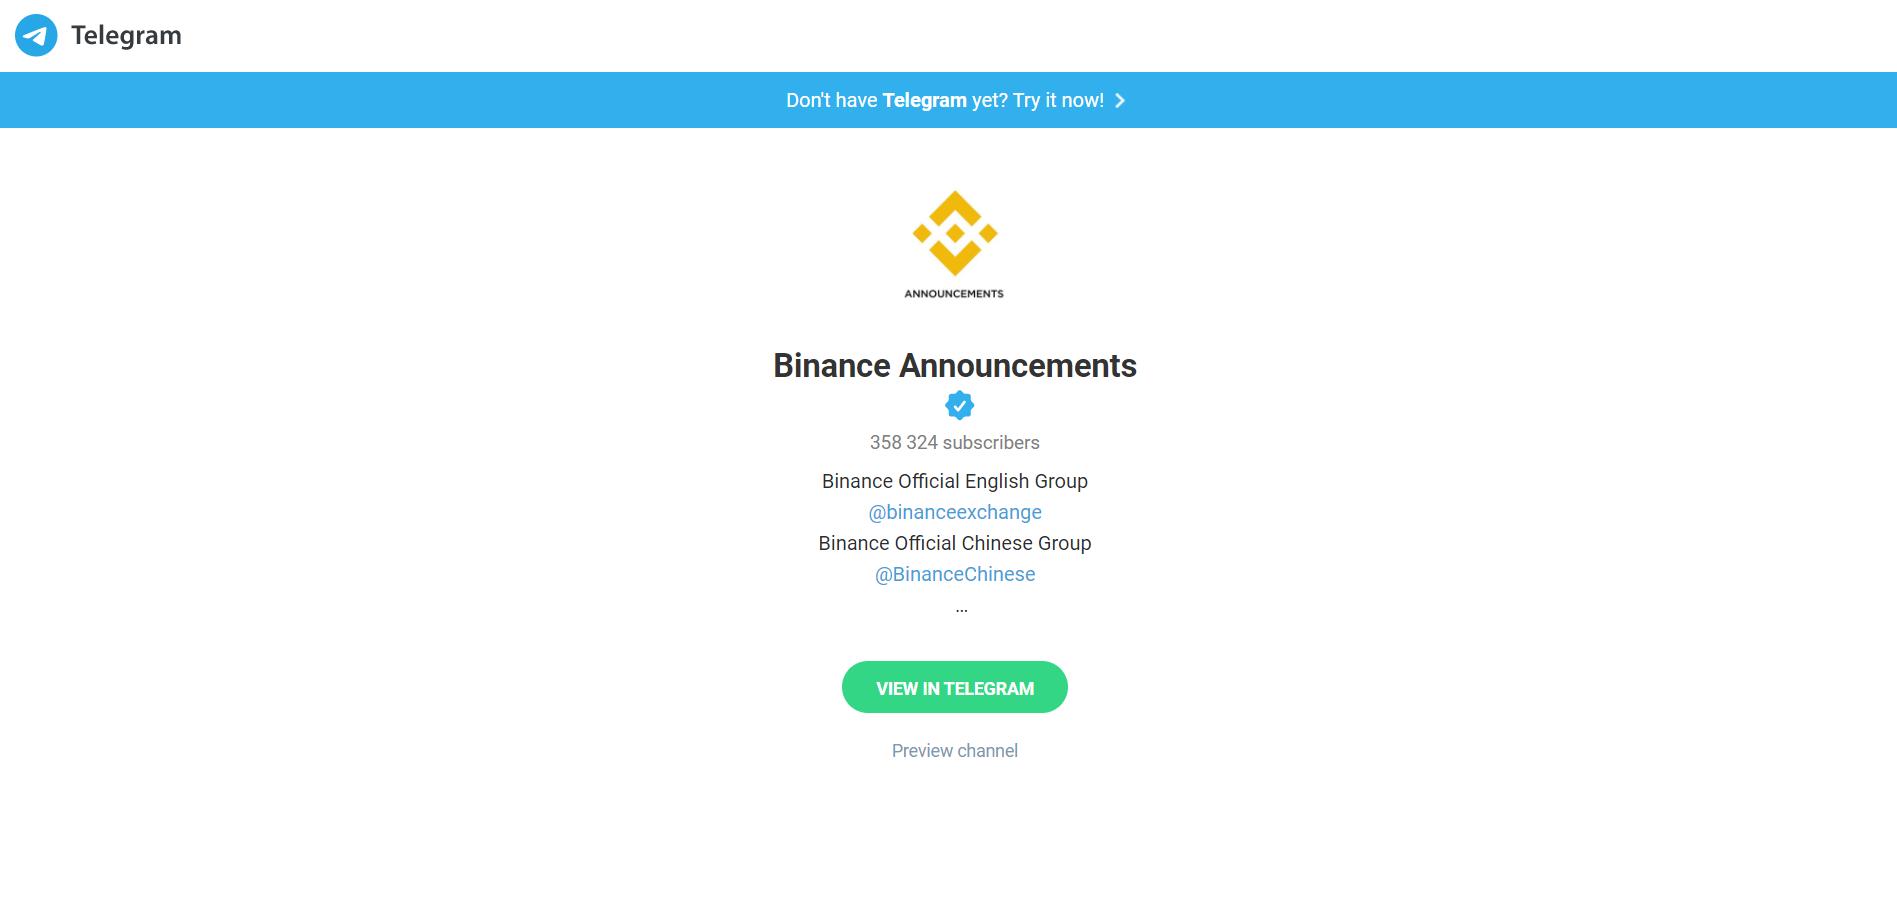 Binance Announcements